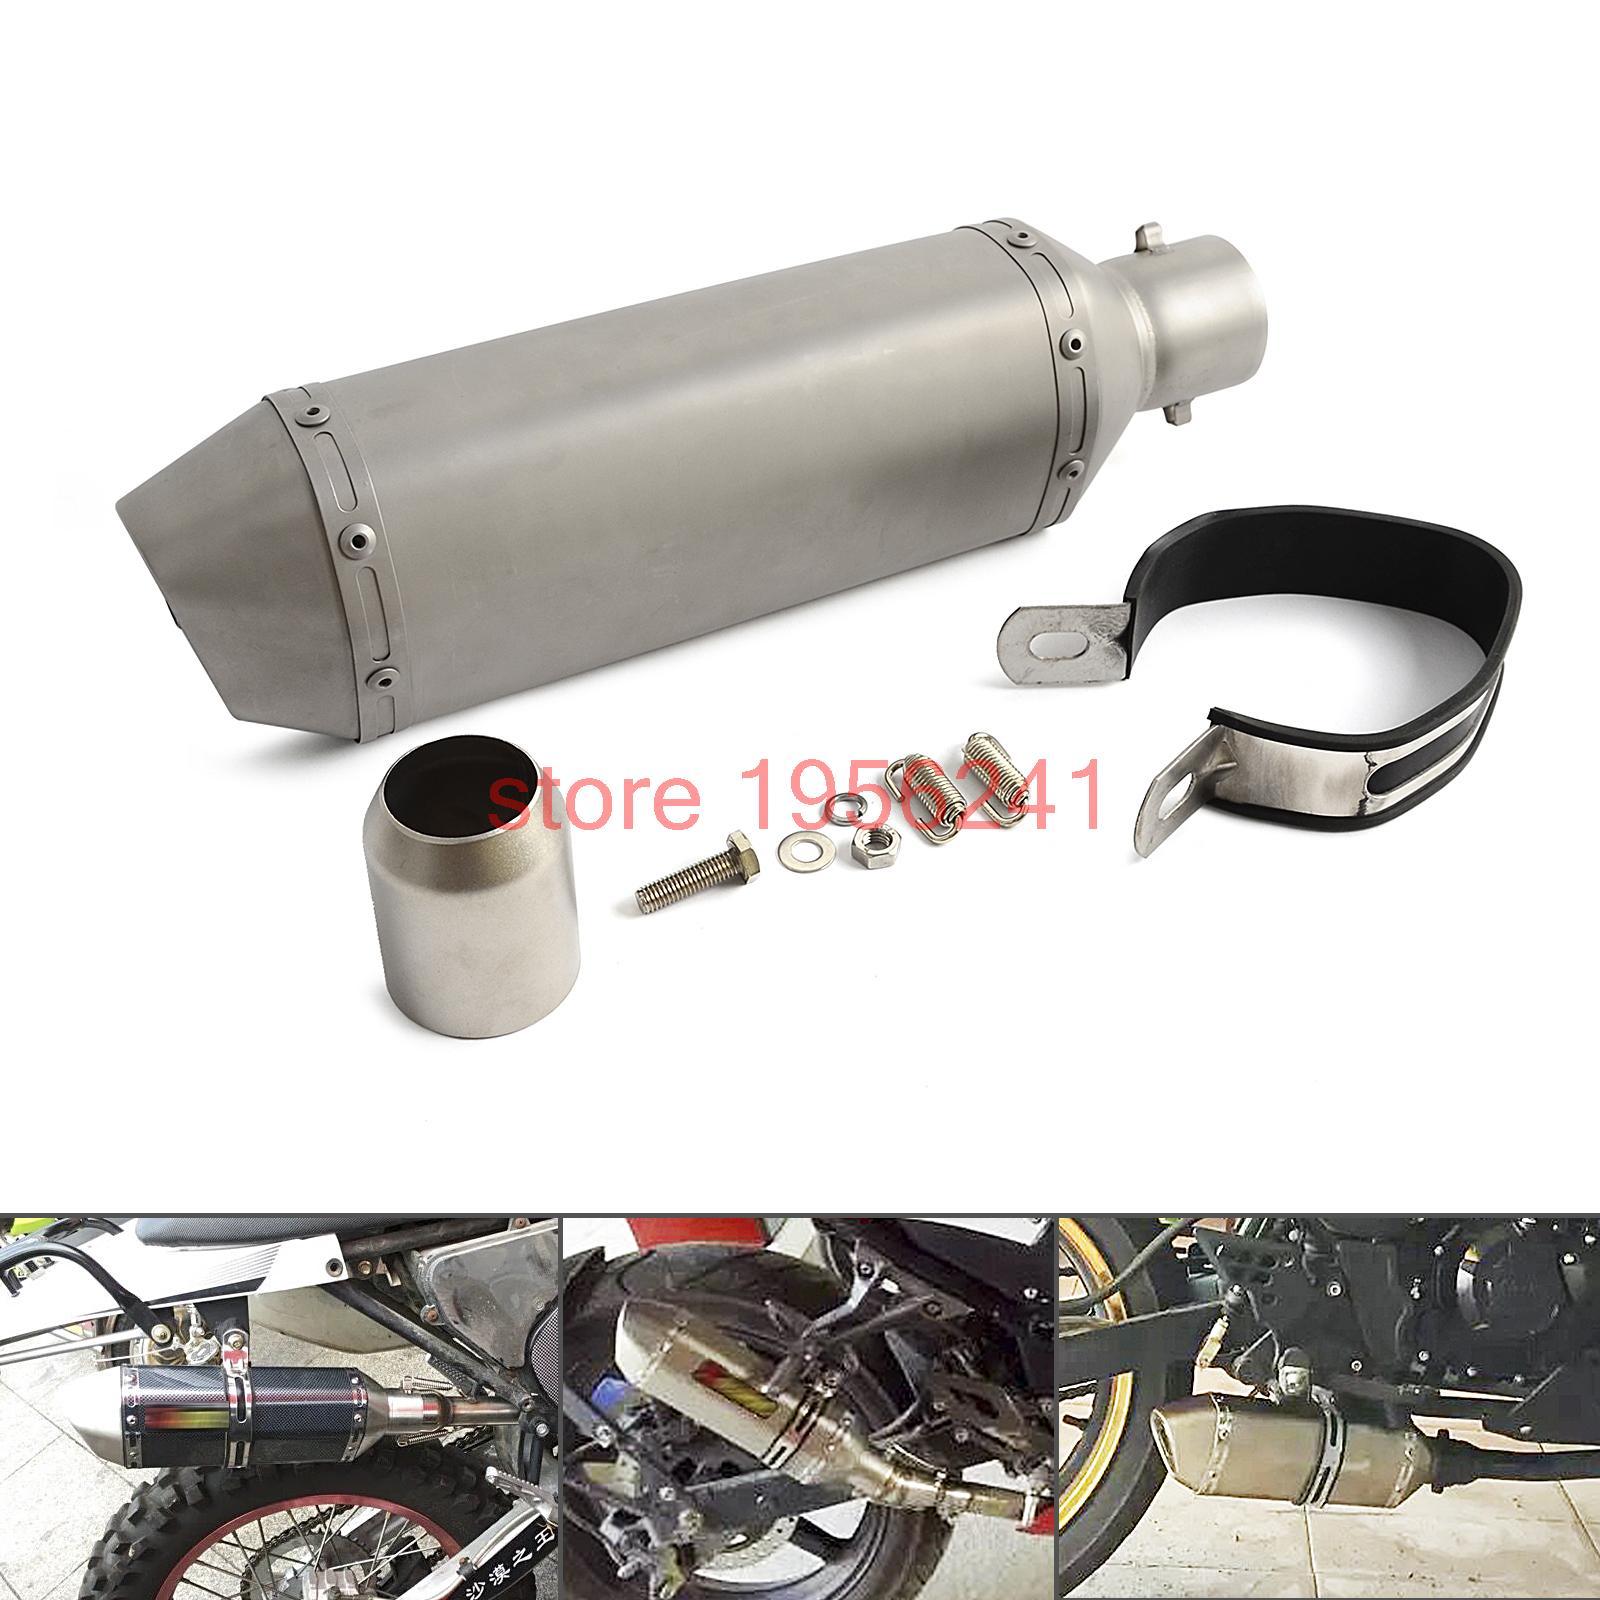 ФОТО 38-51mm Motorcycle Exhaust Muffler Vent With Removable DB Killer Street Bike Dirt Bike Scooter ATV new